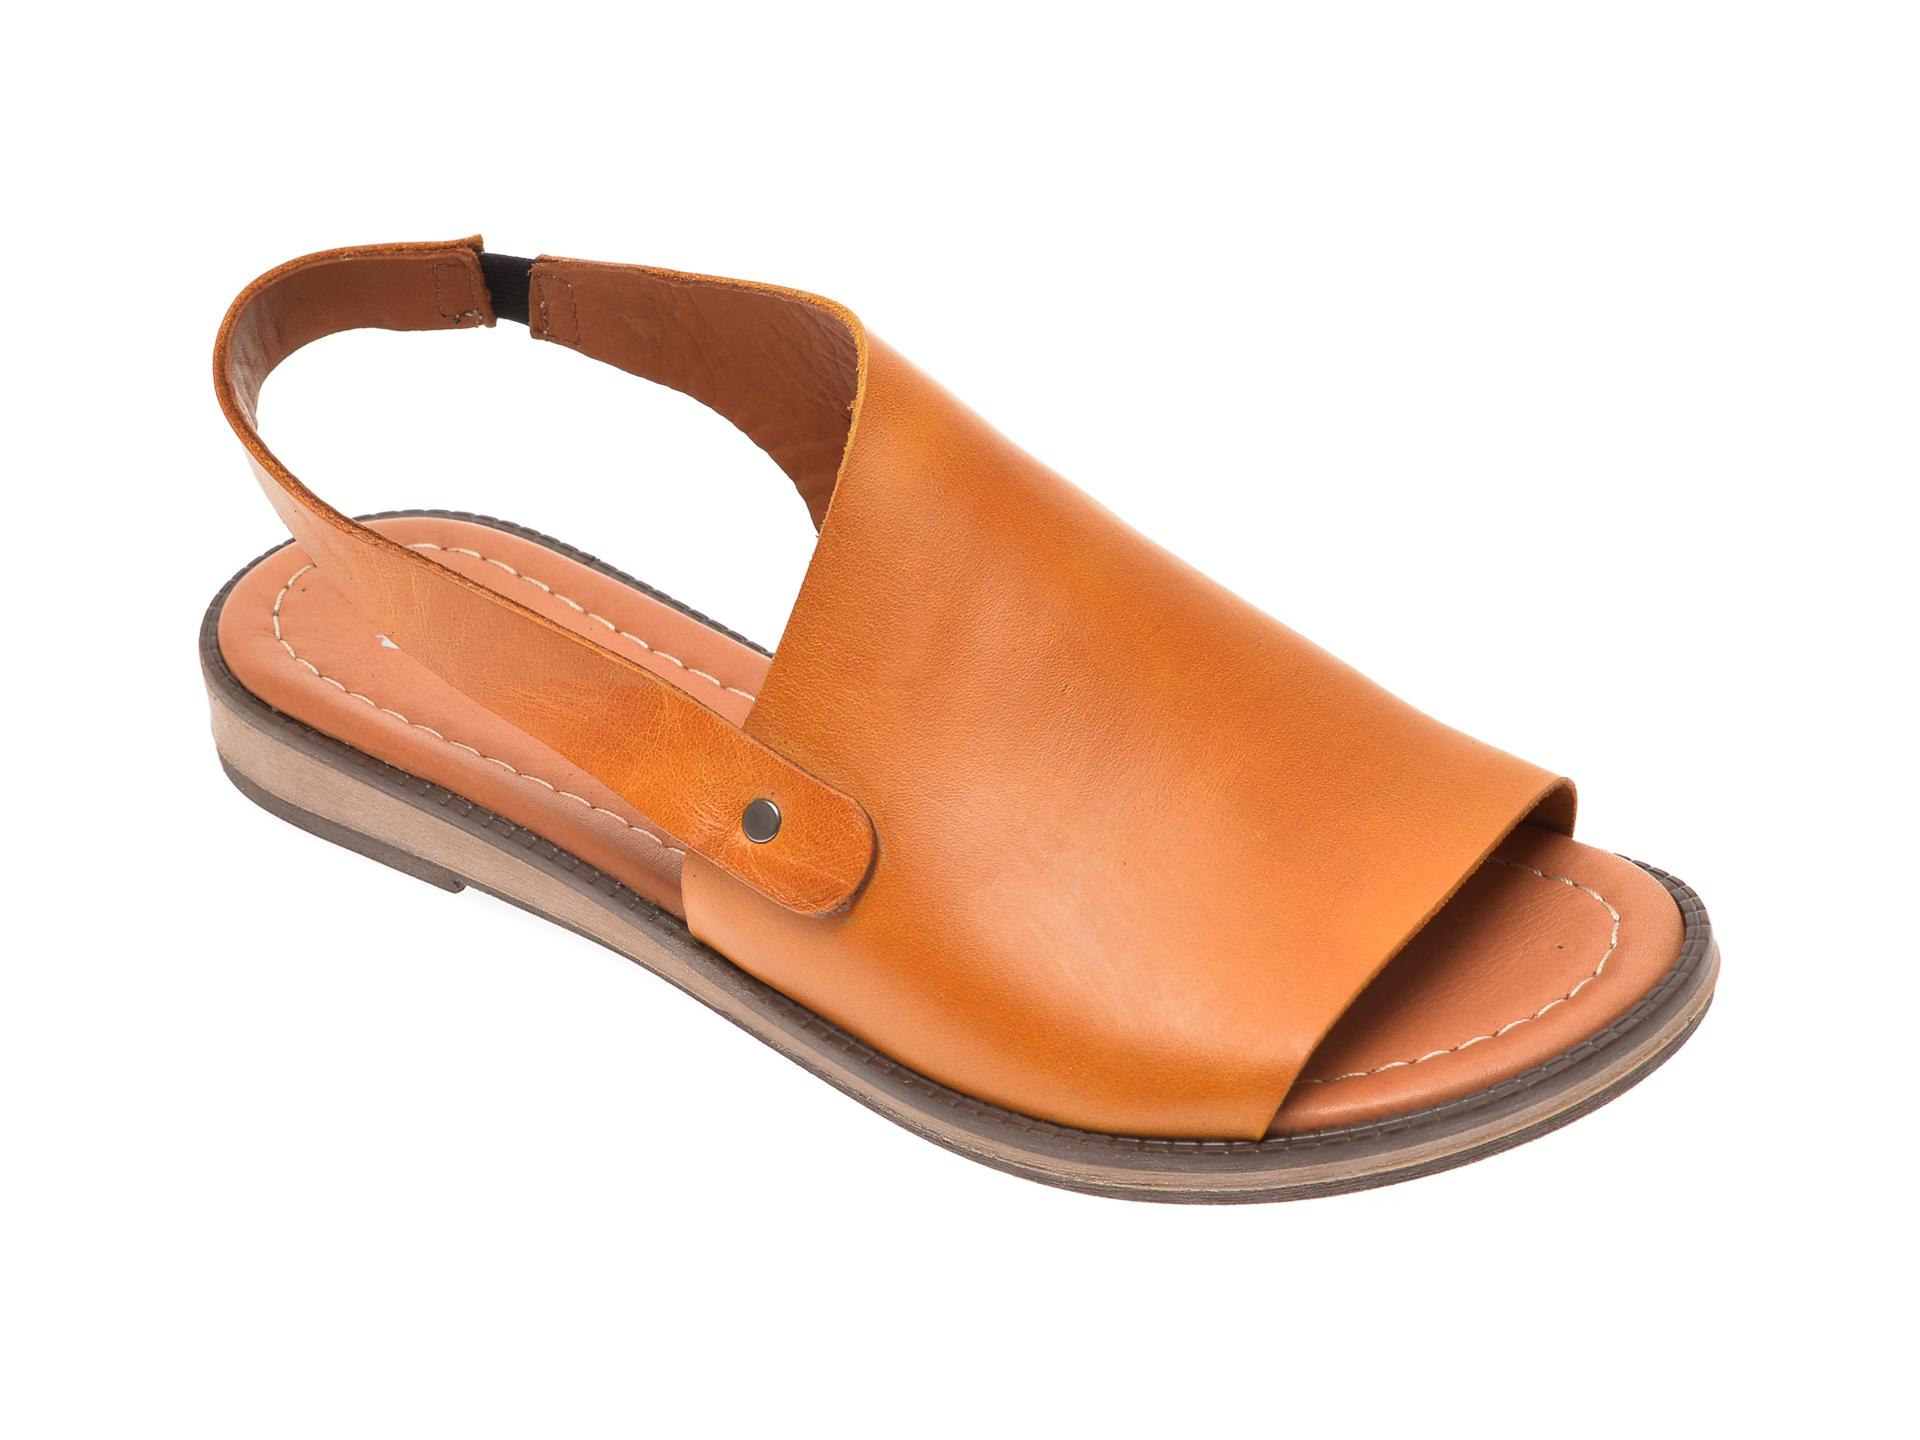 Sandale PASS COLLECTION galbene, 1017K, din piele naturala